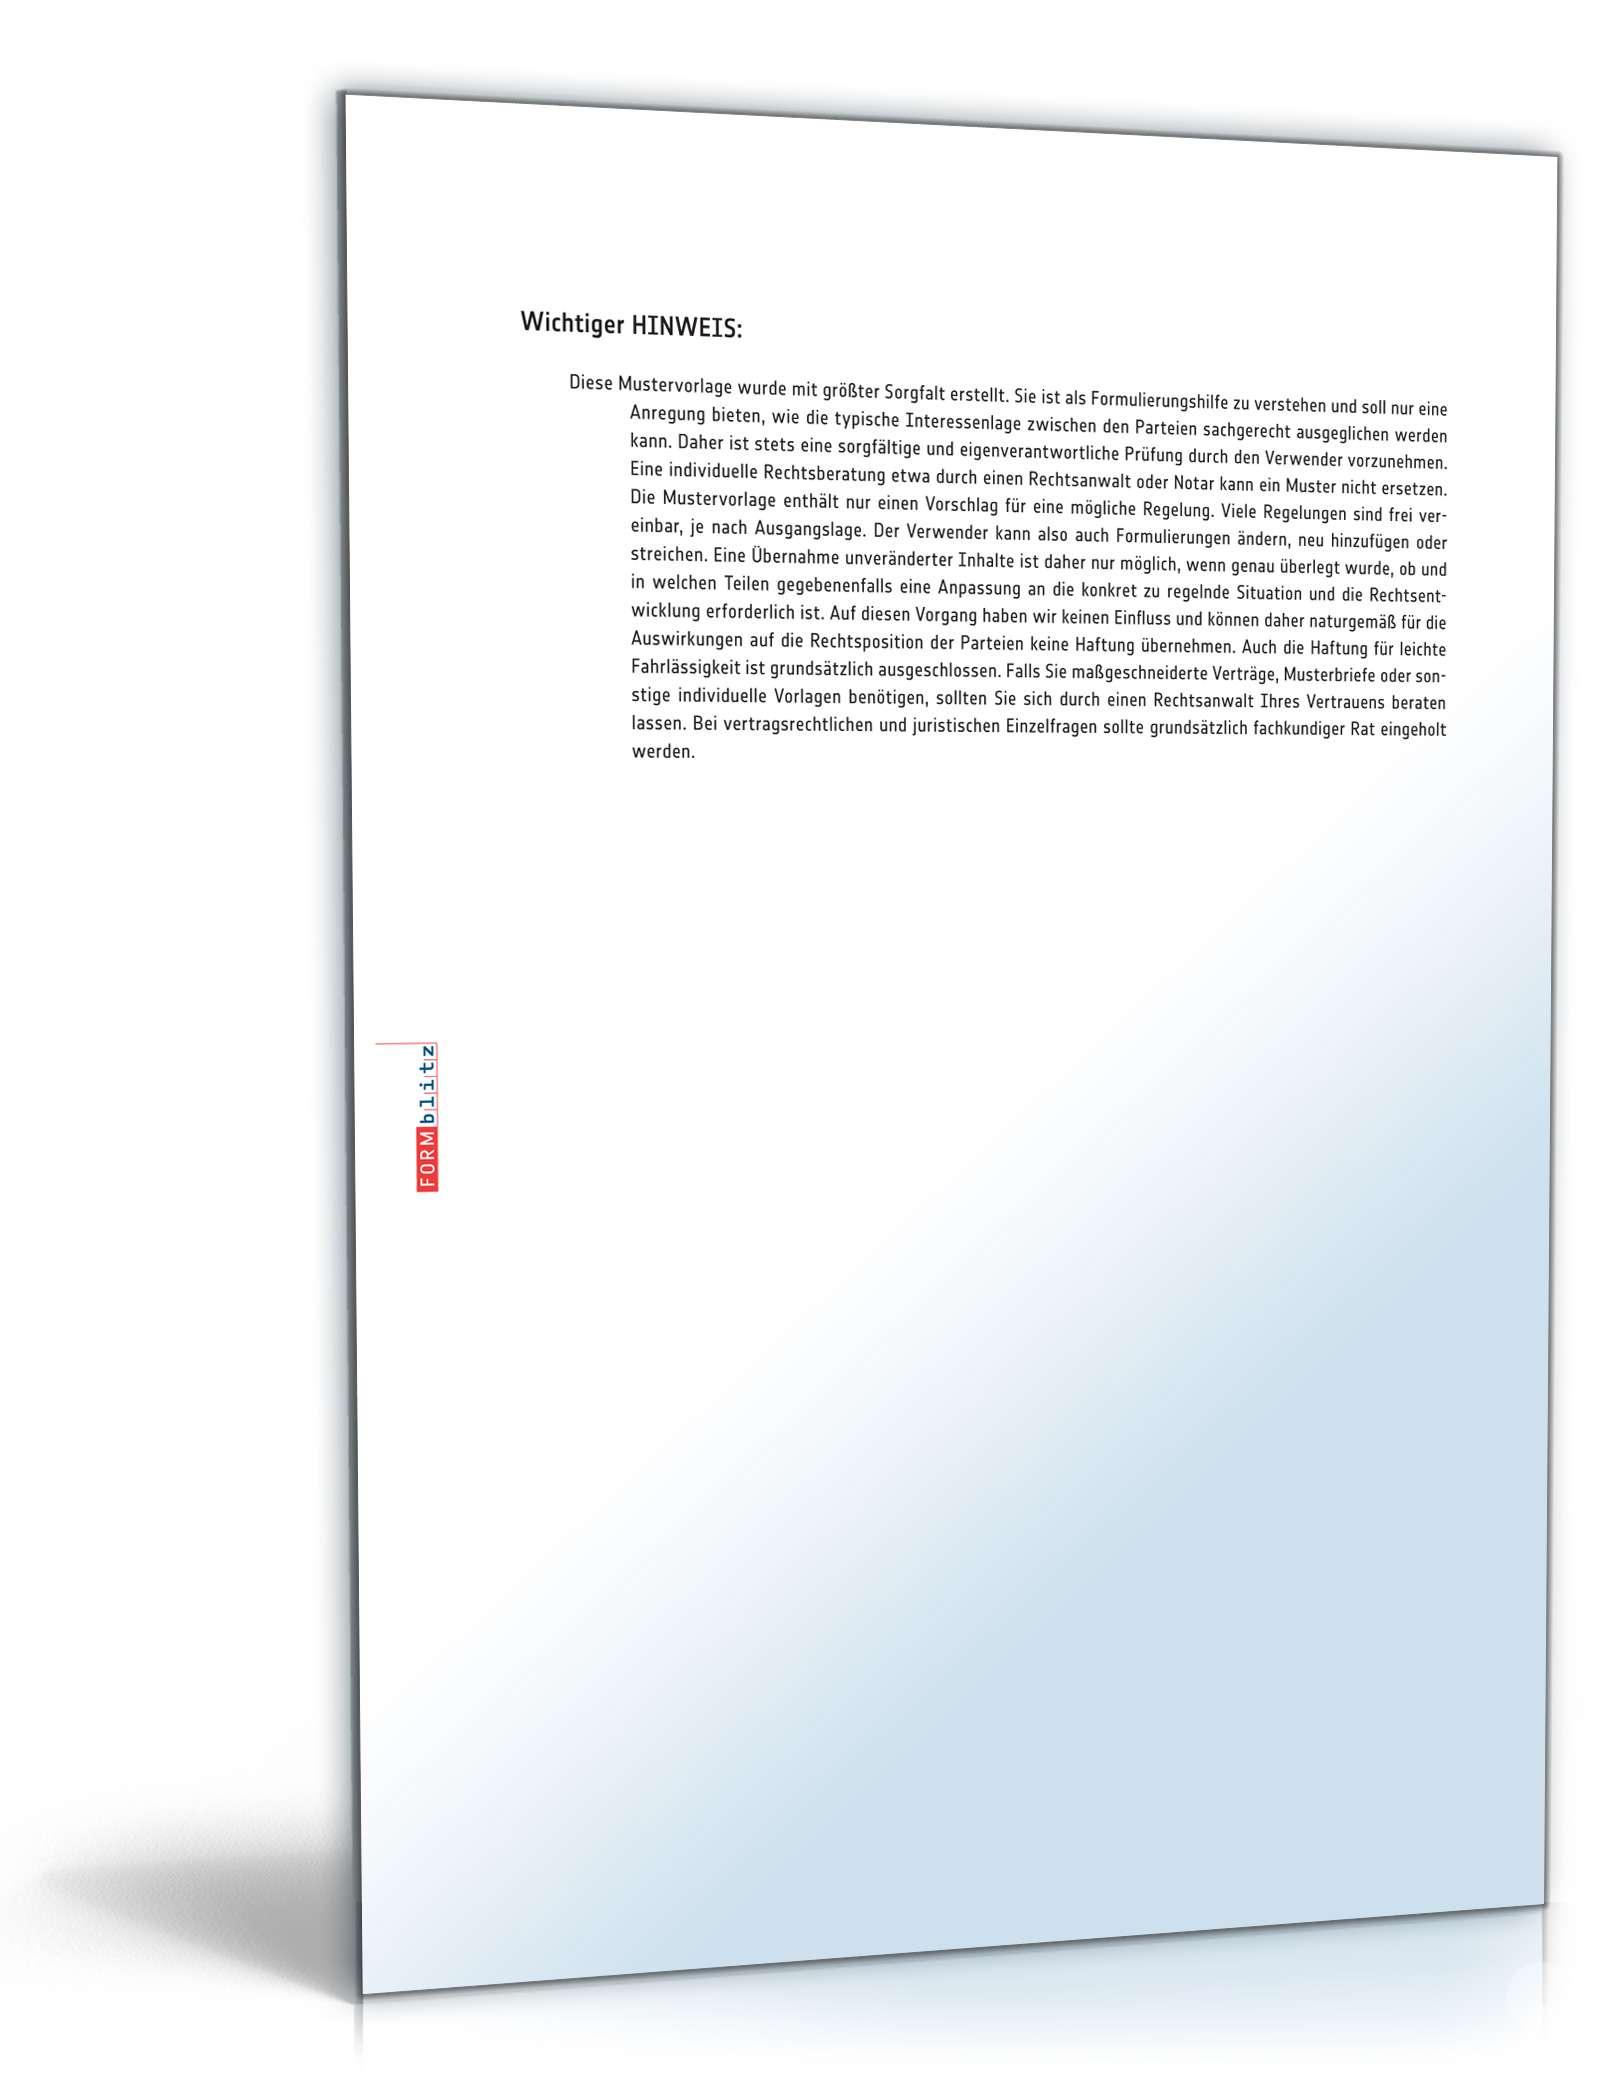 rechnung inland editierbares muster zum download. Black Bedroom Furniture Sets. Home Design Ideas